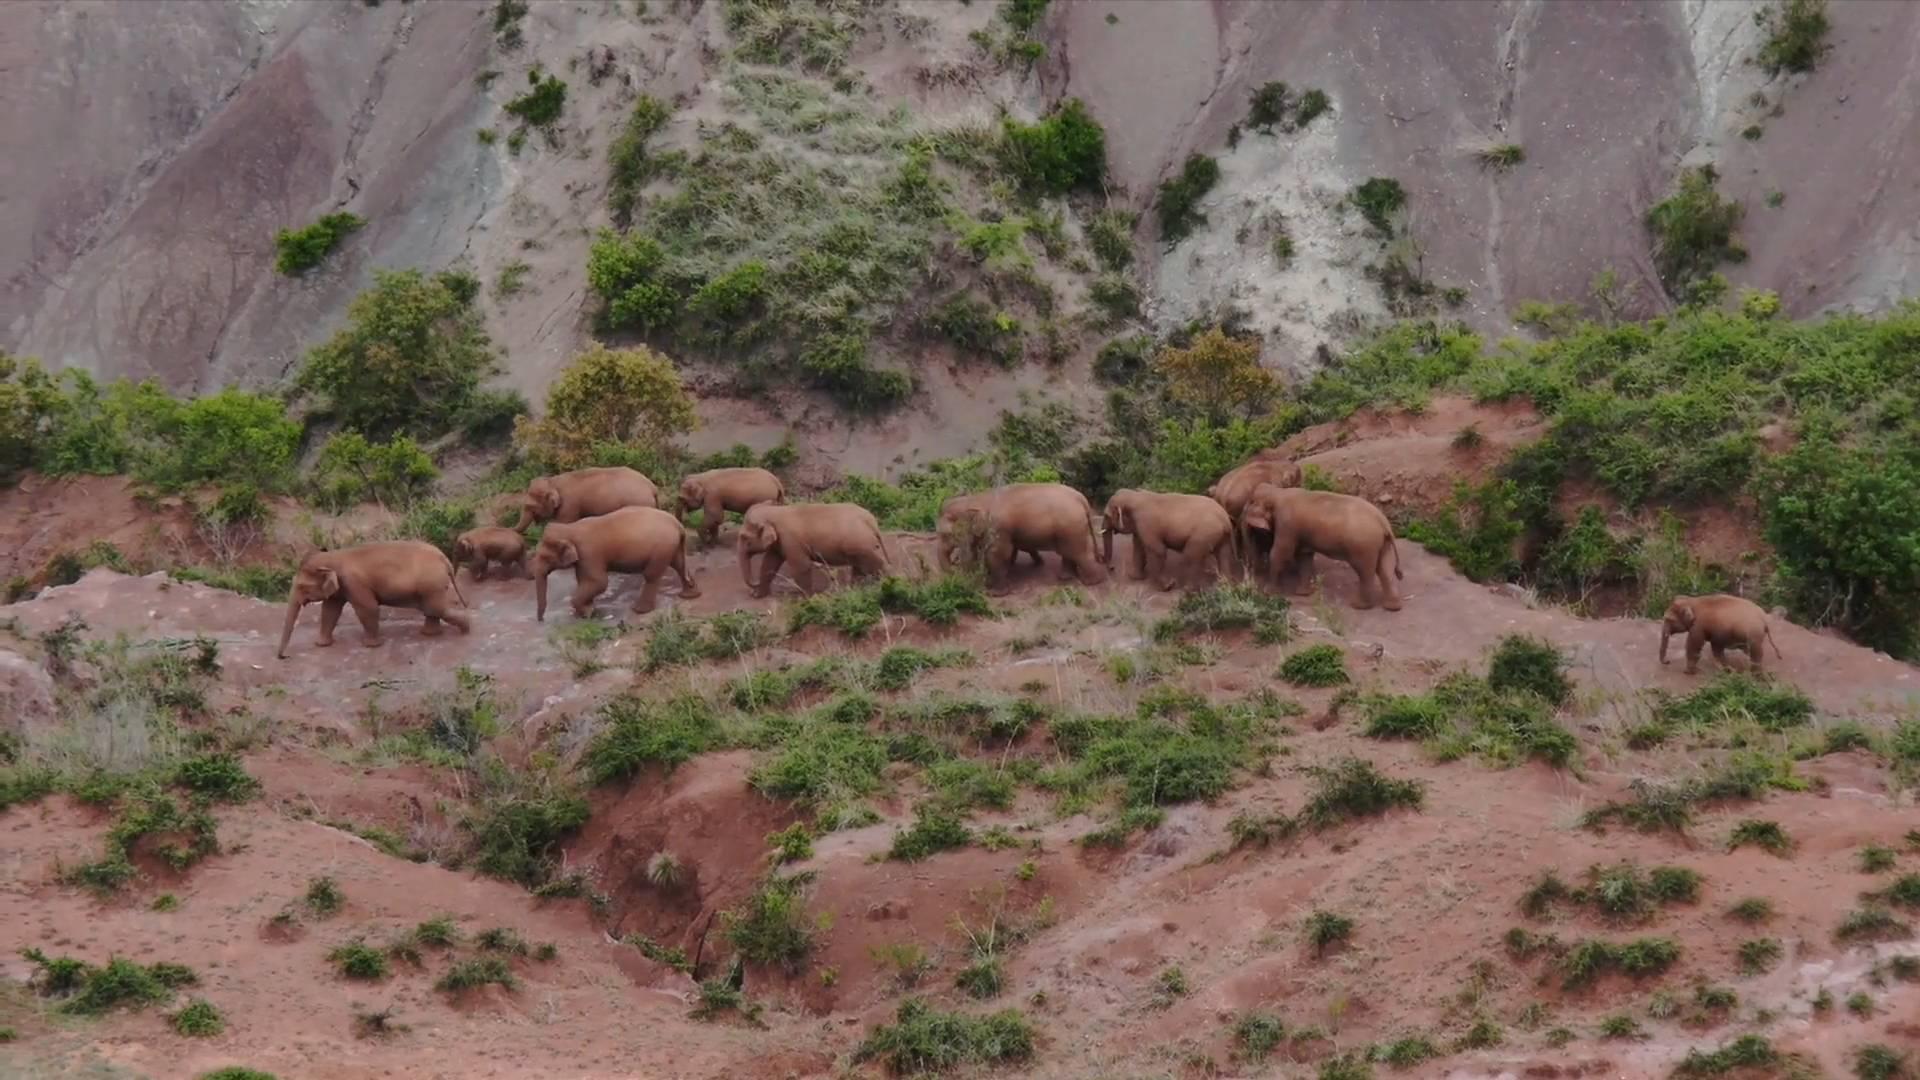 GLOBALink | China's migrating elephant herd increasingly active